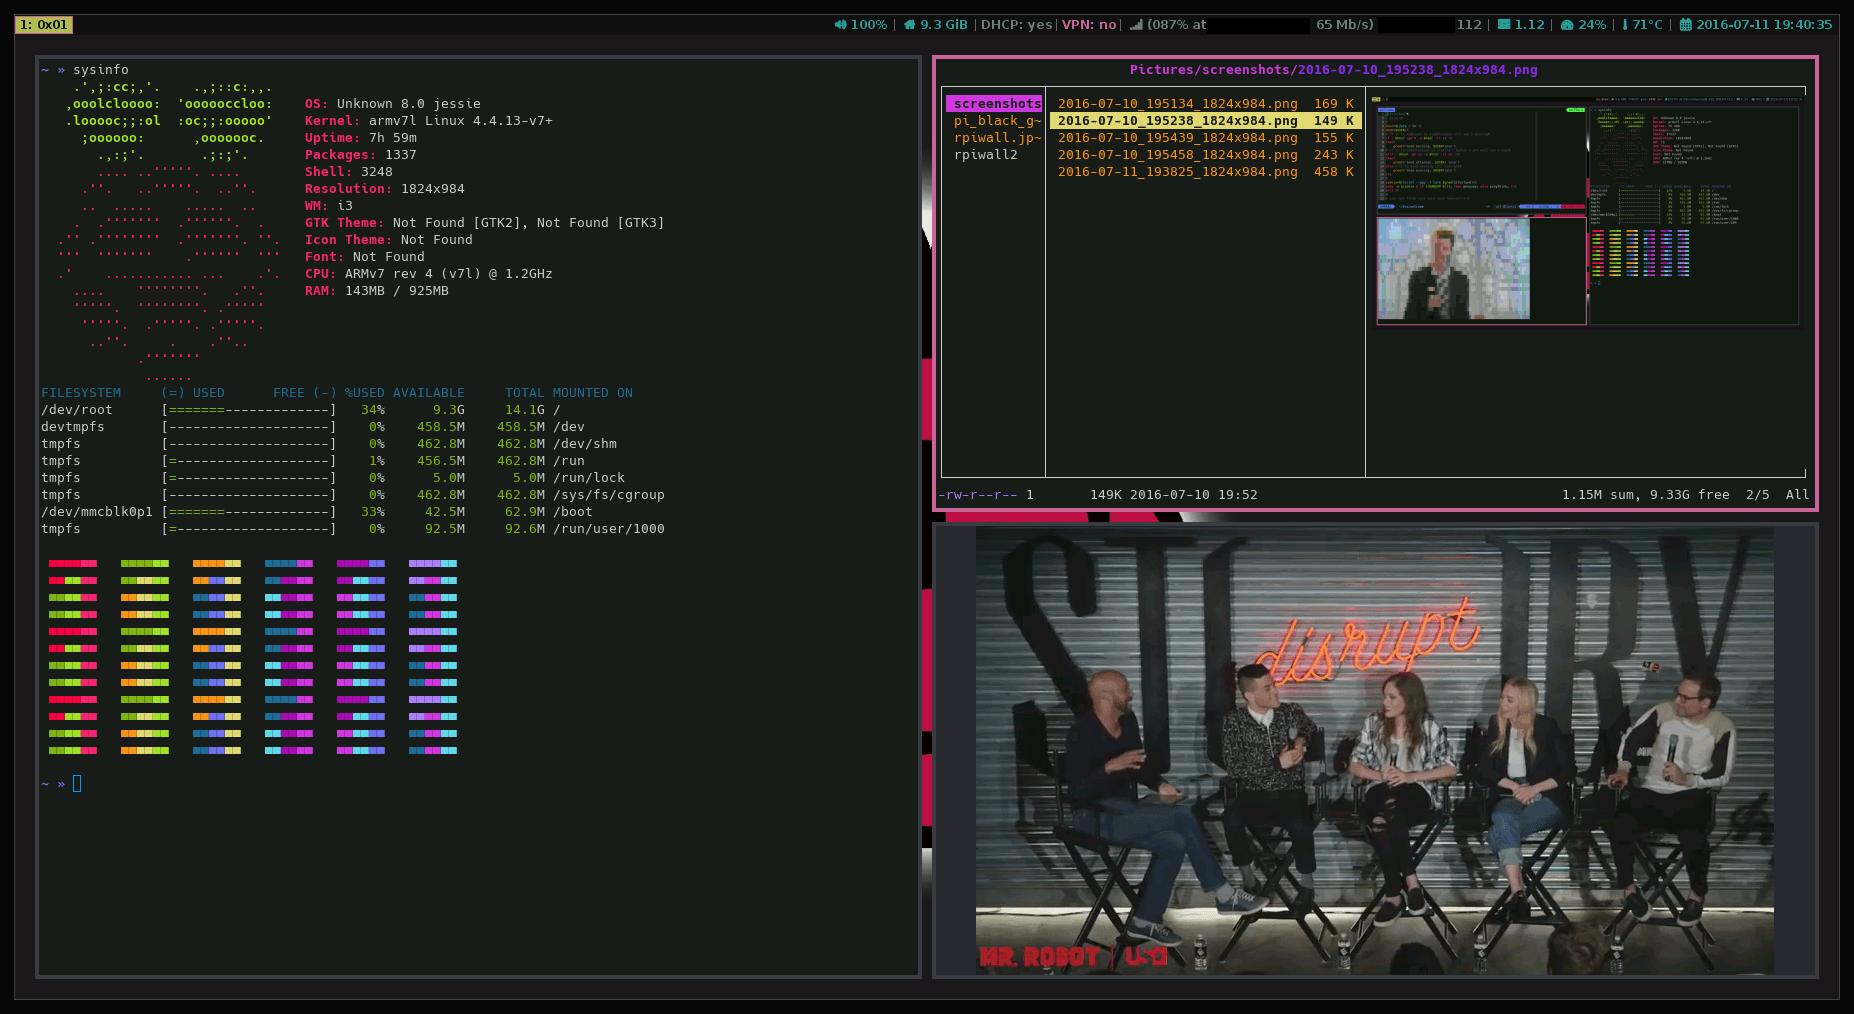 RPI3: Raspbian, i3wm-gaps